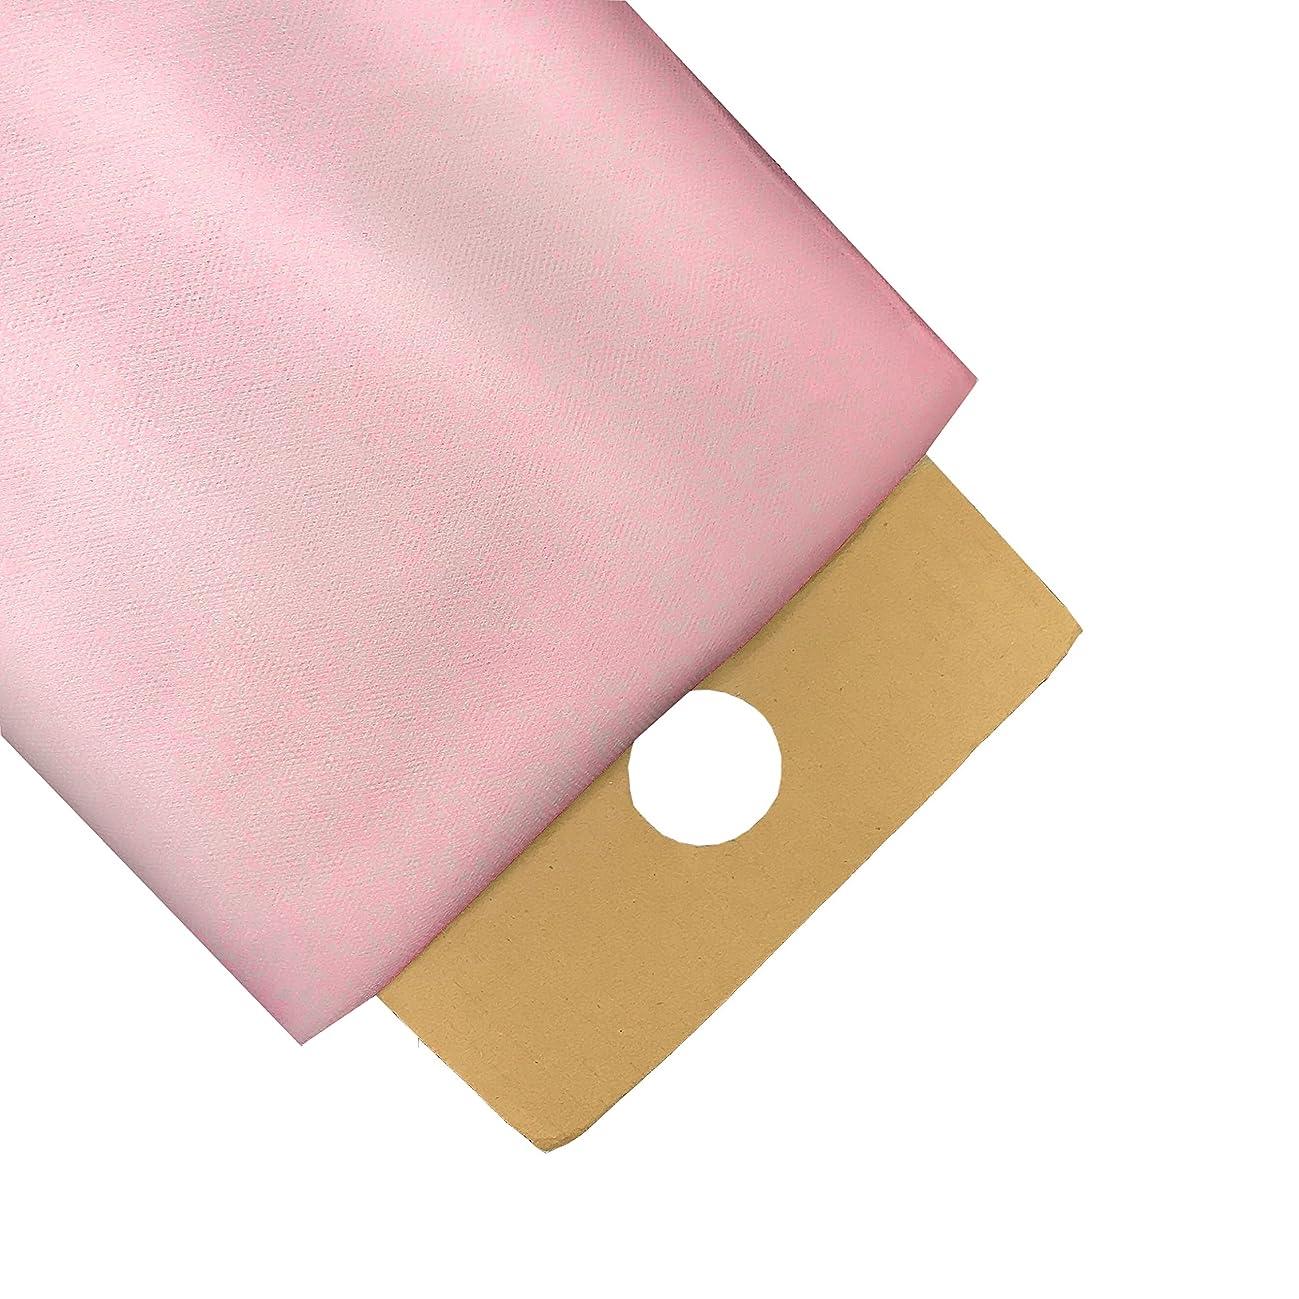 LA Linen 40-Yard Tulle Fabric Bolt, Light Pink, 54-Inch Wide